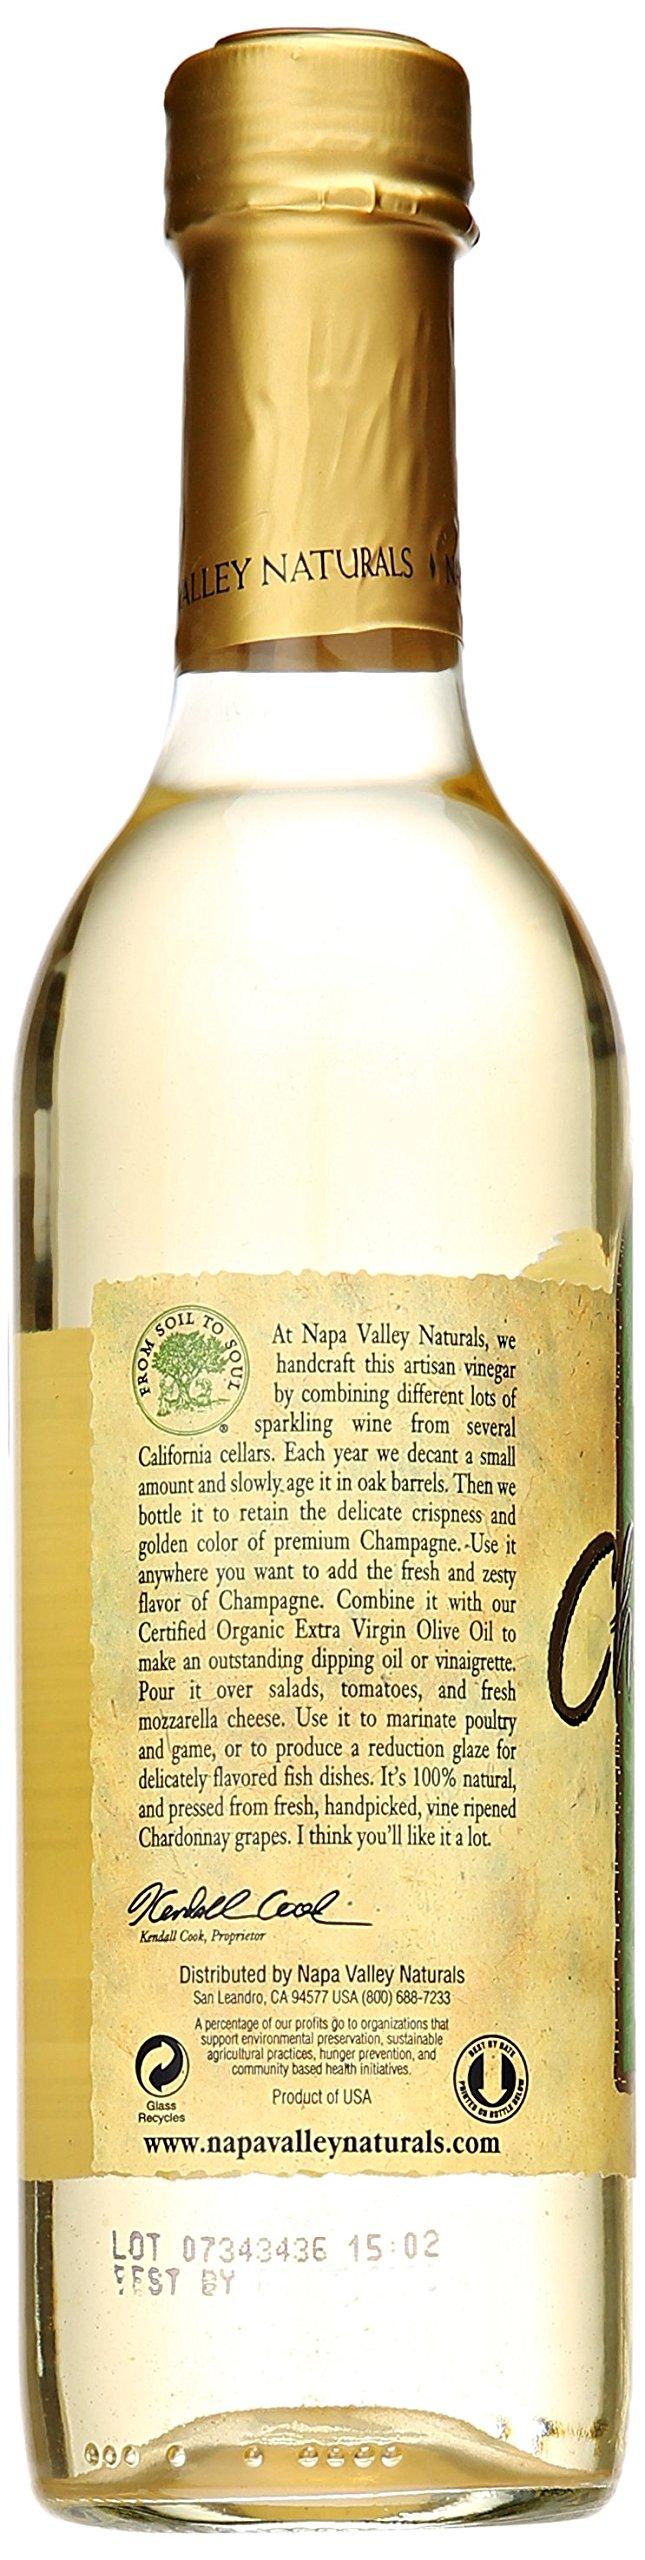 Napa Valley, Champagne Vinegar, 12.7 oz by Napa Valley Naturals (Image #4)